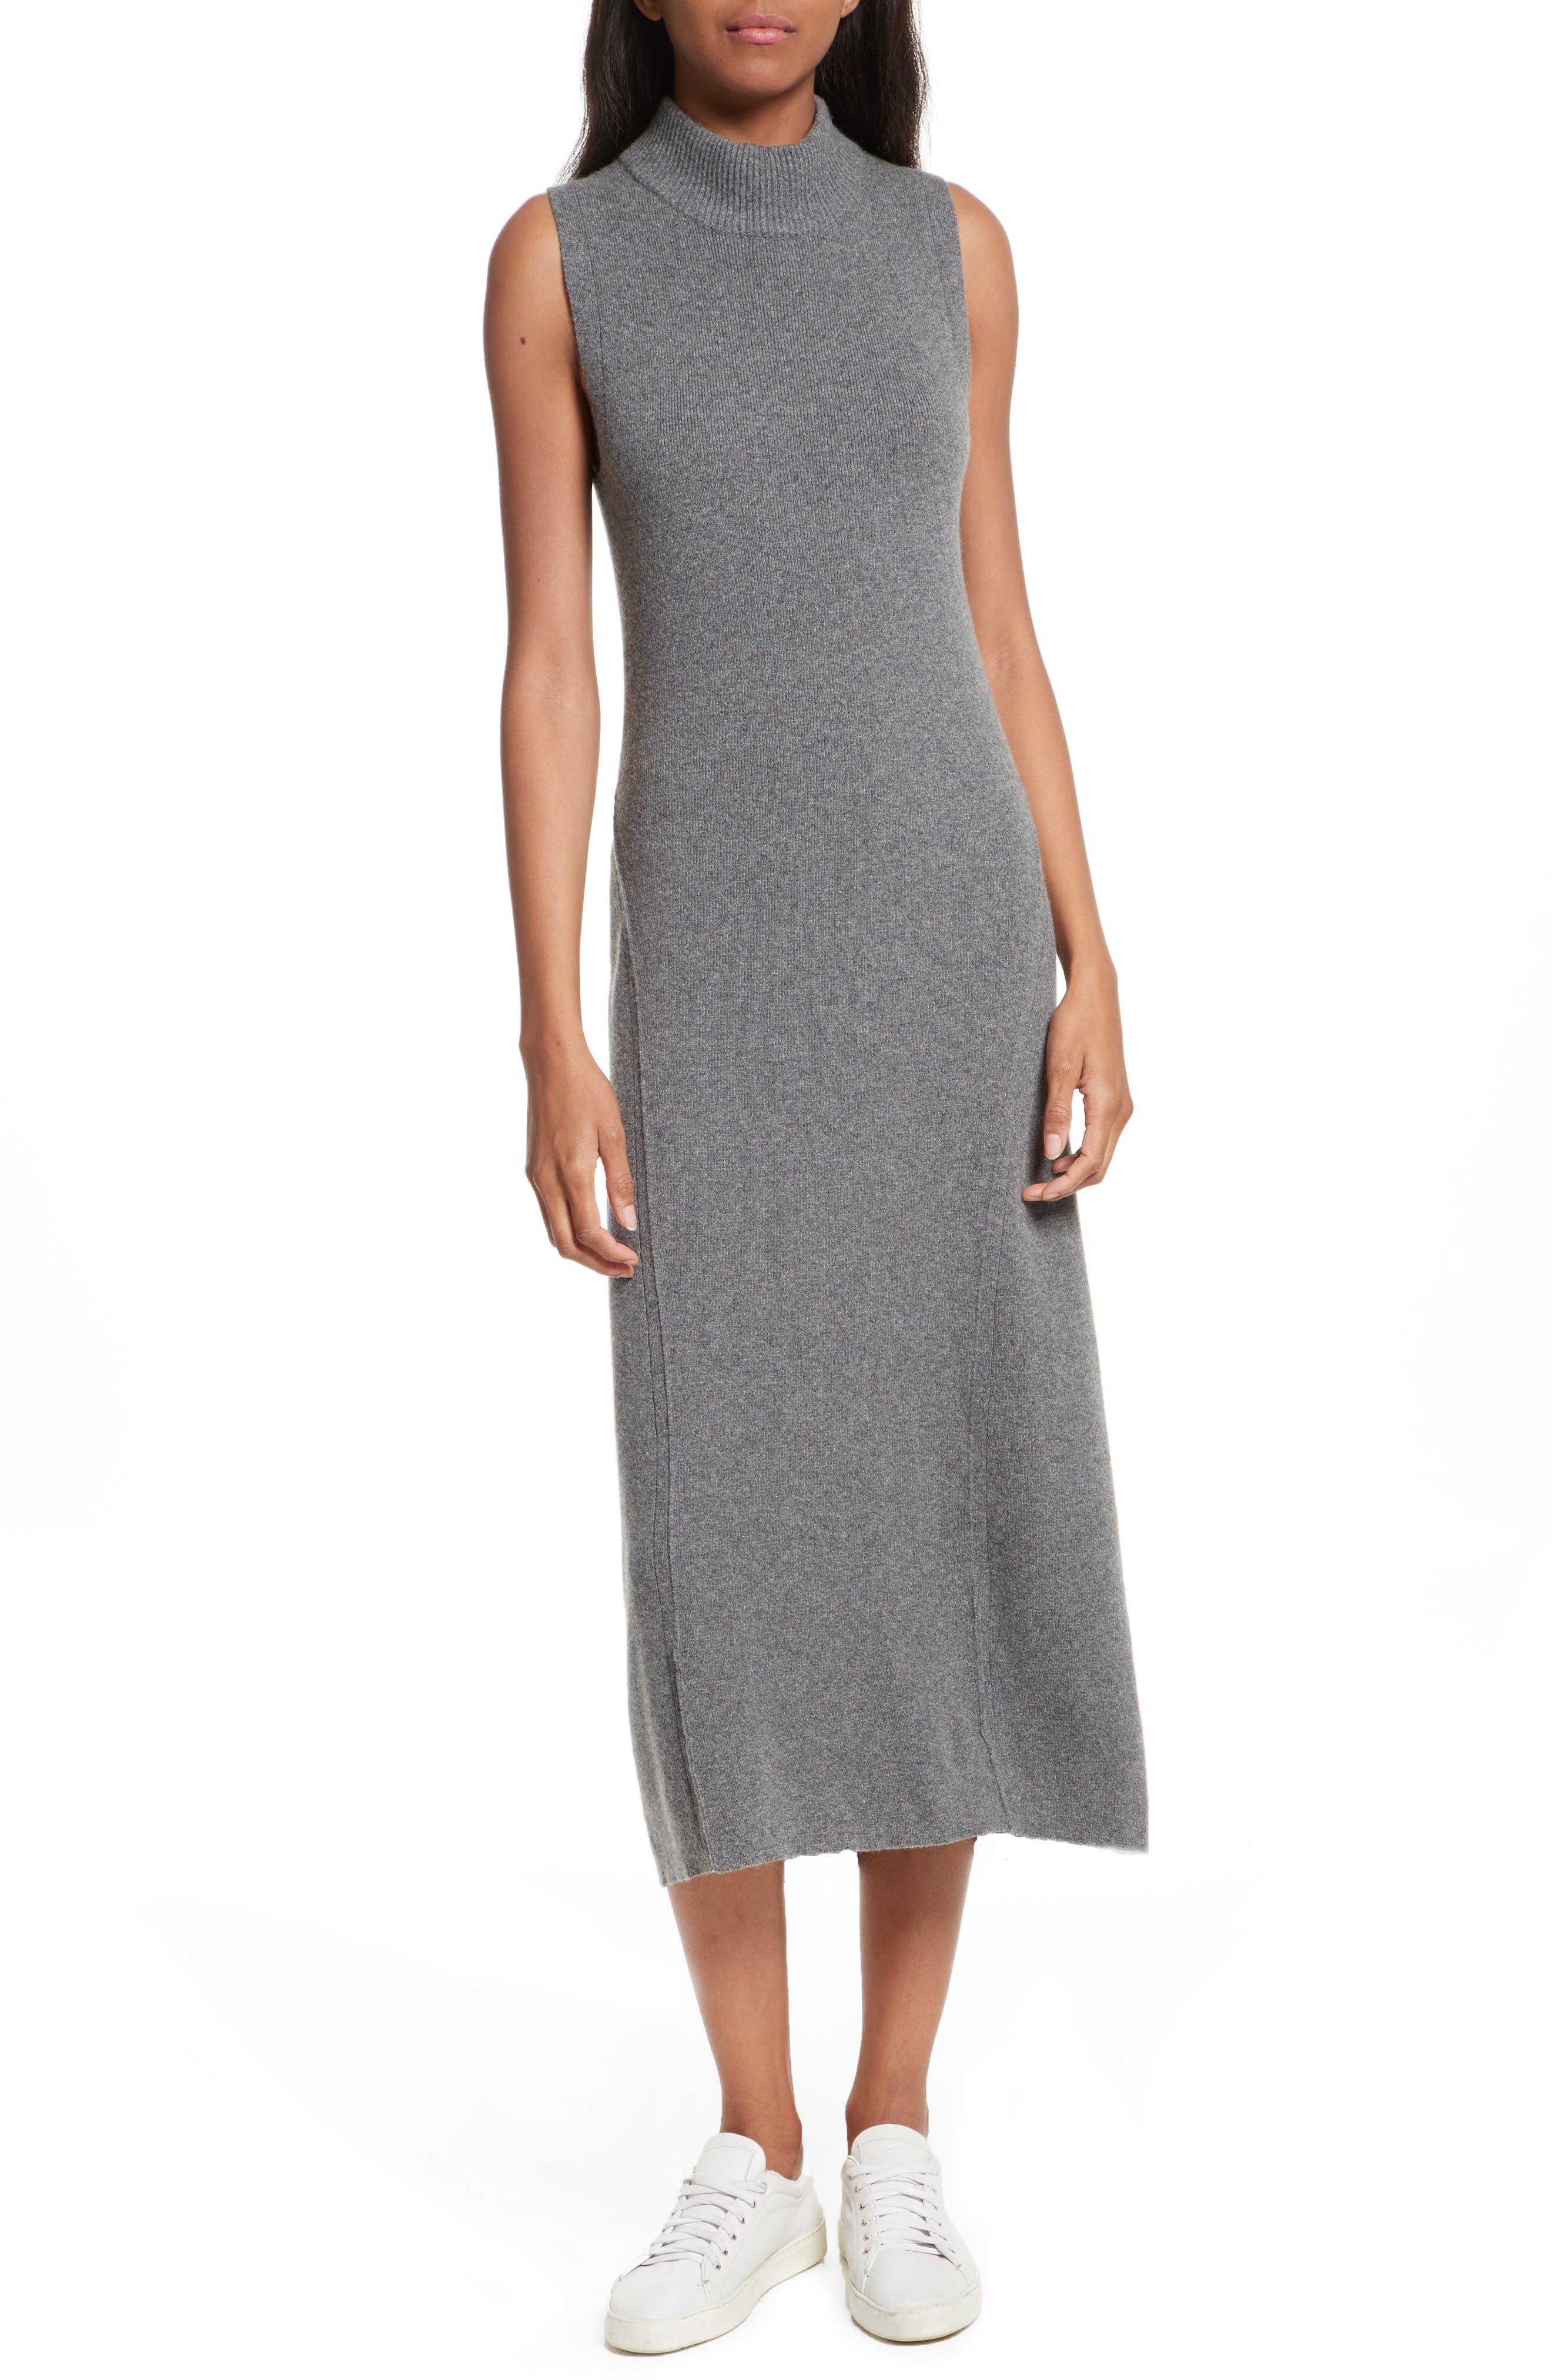 Ace Cashmere Mock Neck Sweater Dress,                         Main,                         color, 060